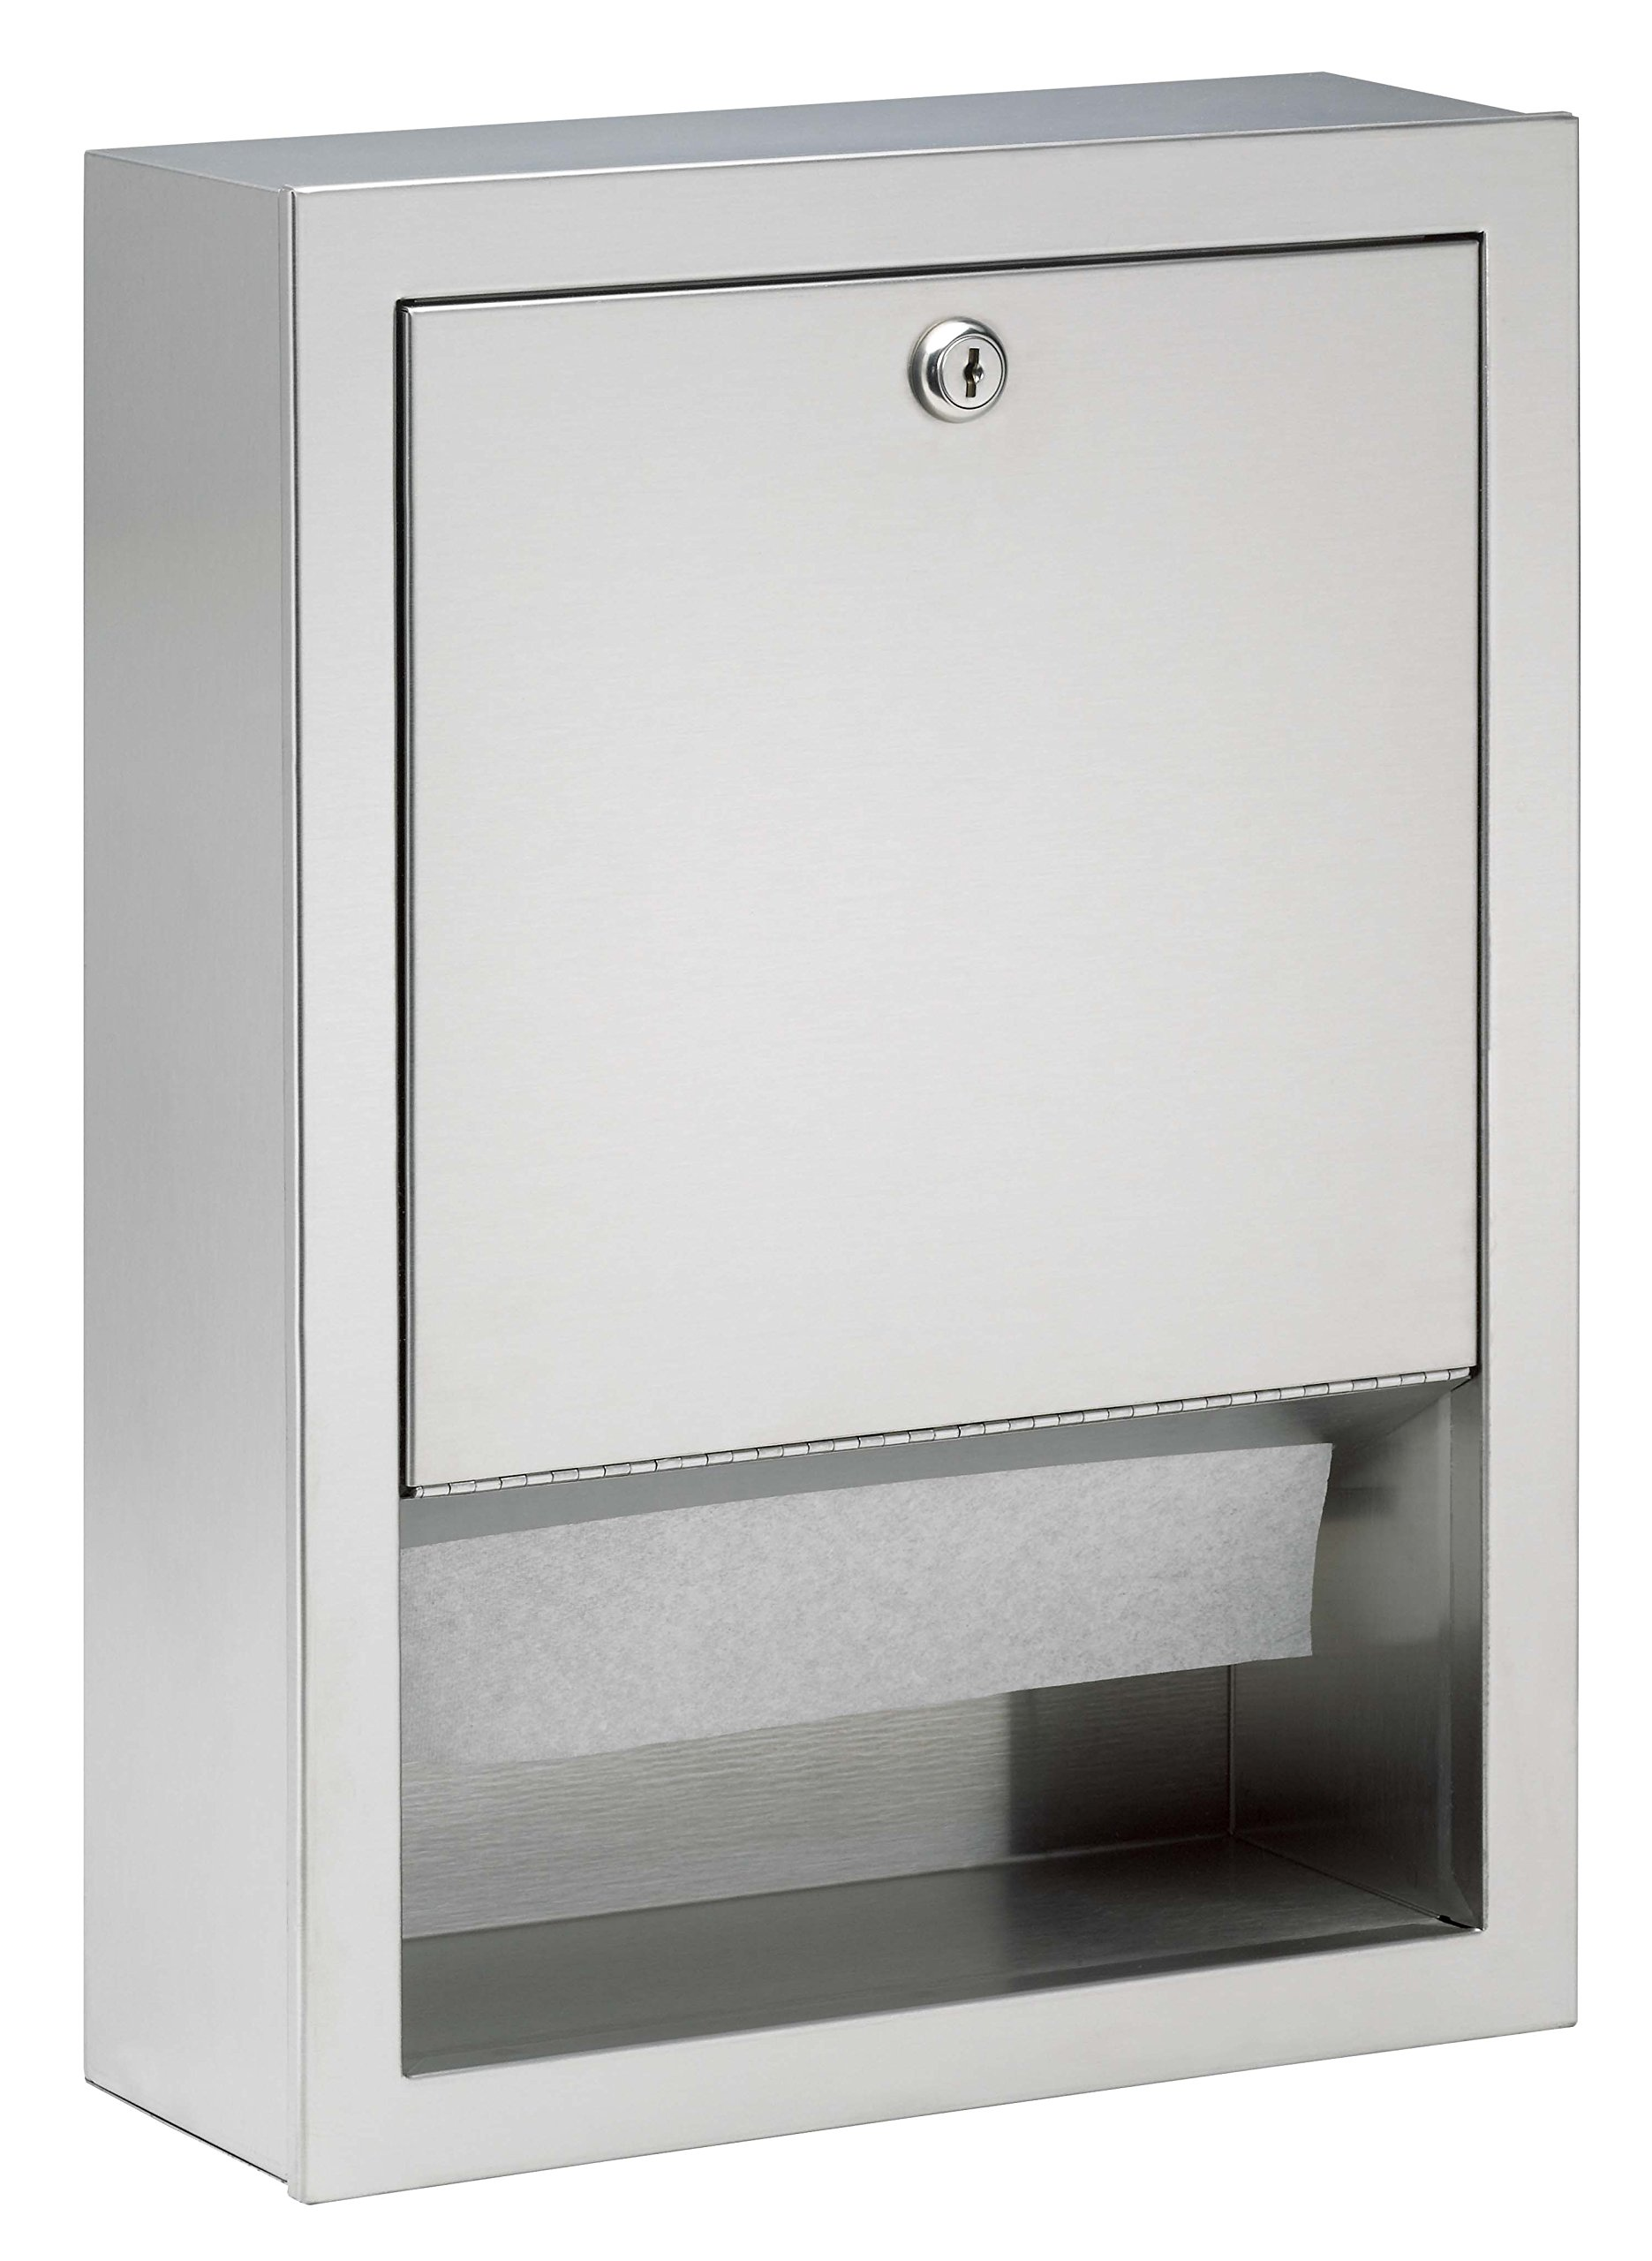 Bradley Corporation 2441-110000 Bradley 2441-110000 Towel Disp, Folded, Surface Mounted